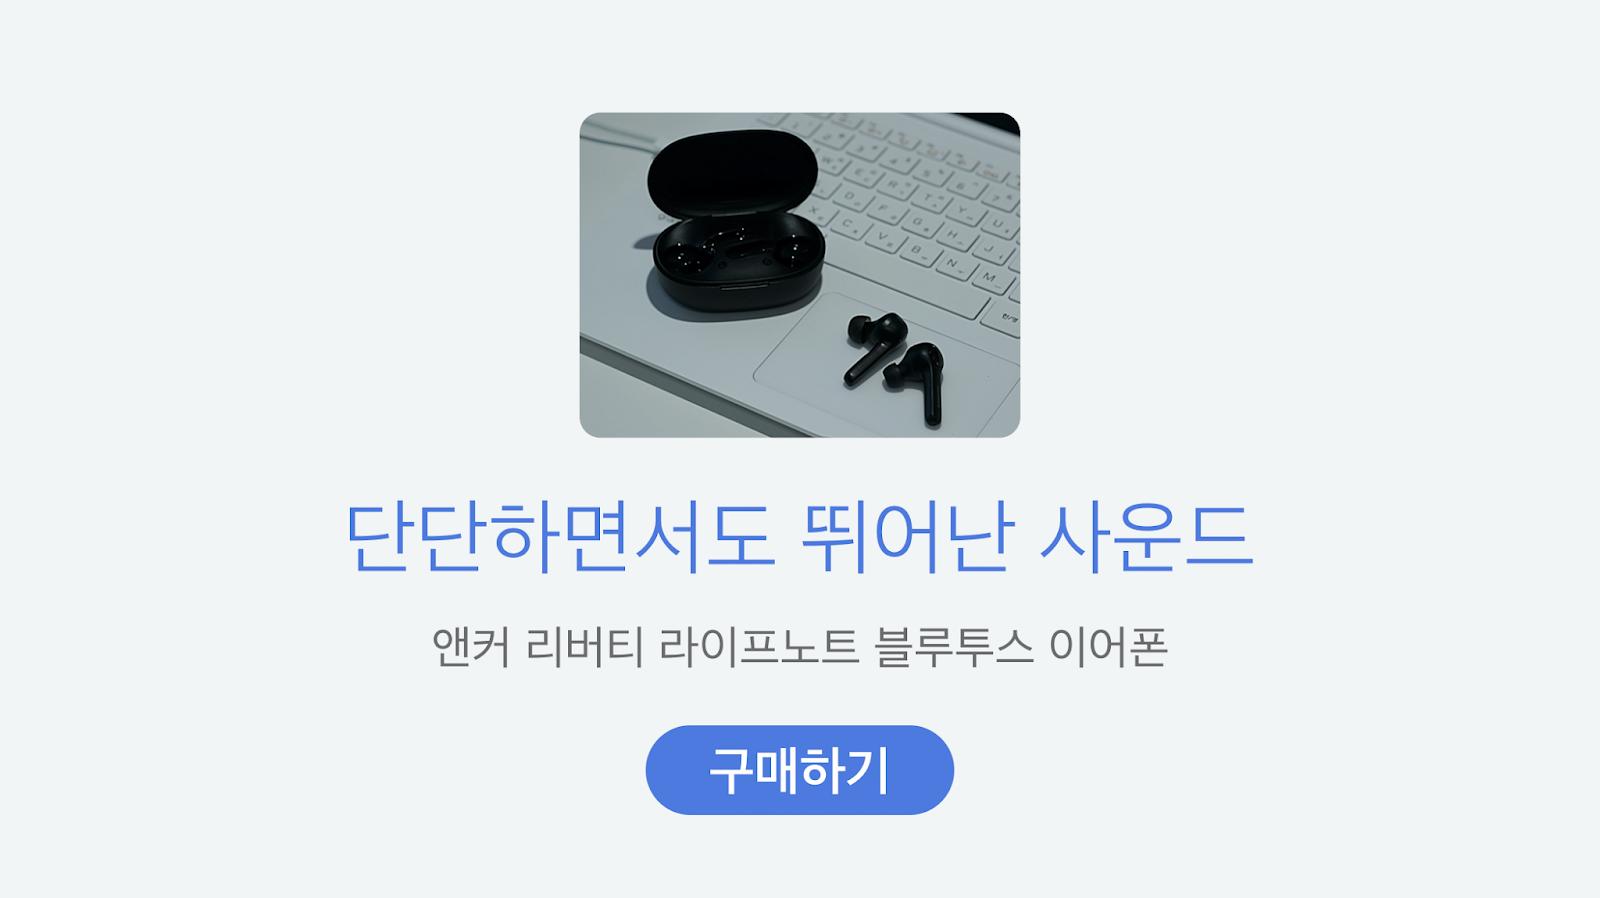 http://www.hyundaihmall.com/front/pda/itemPtc.do?preview=true&slitmCd=2100628467